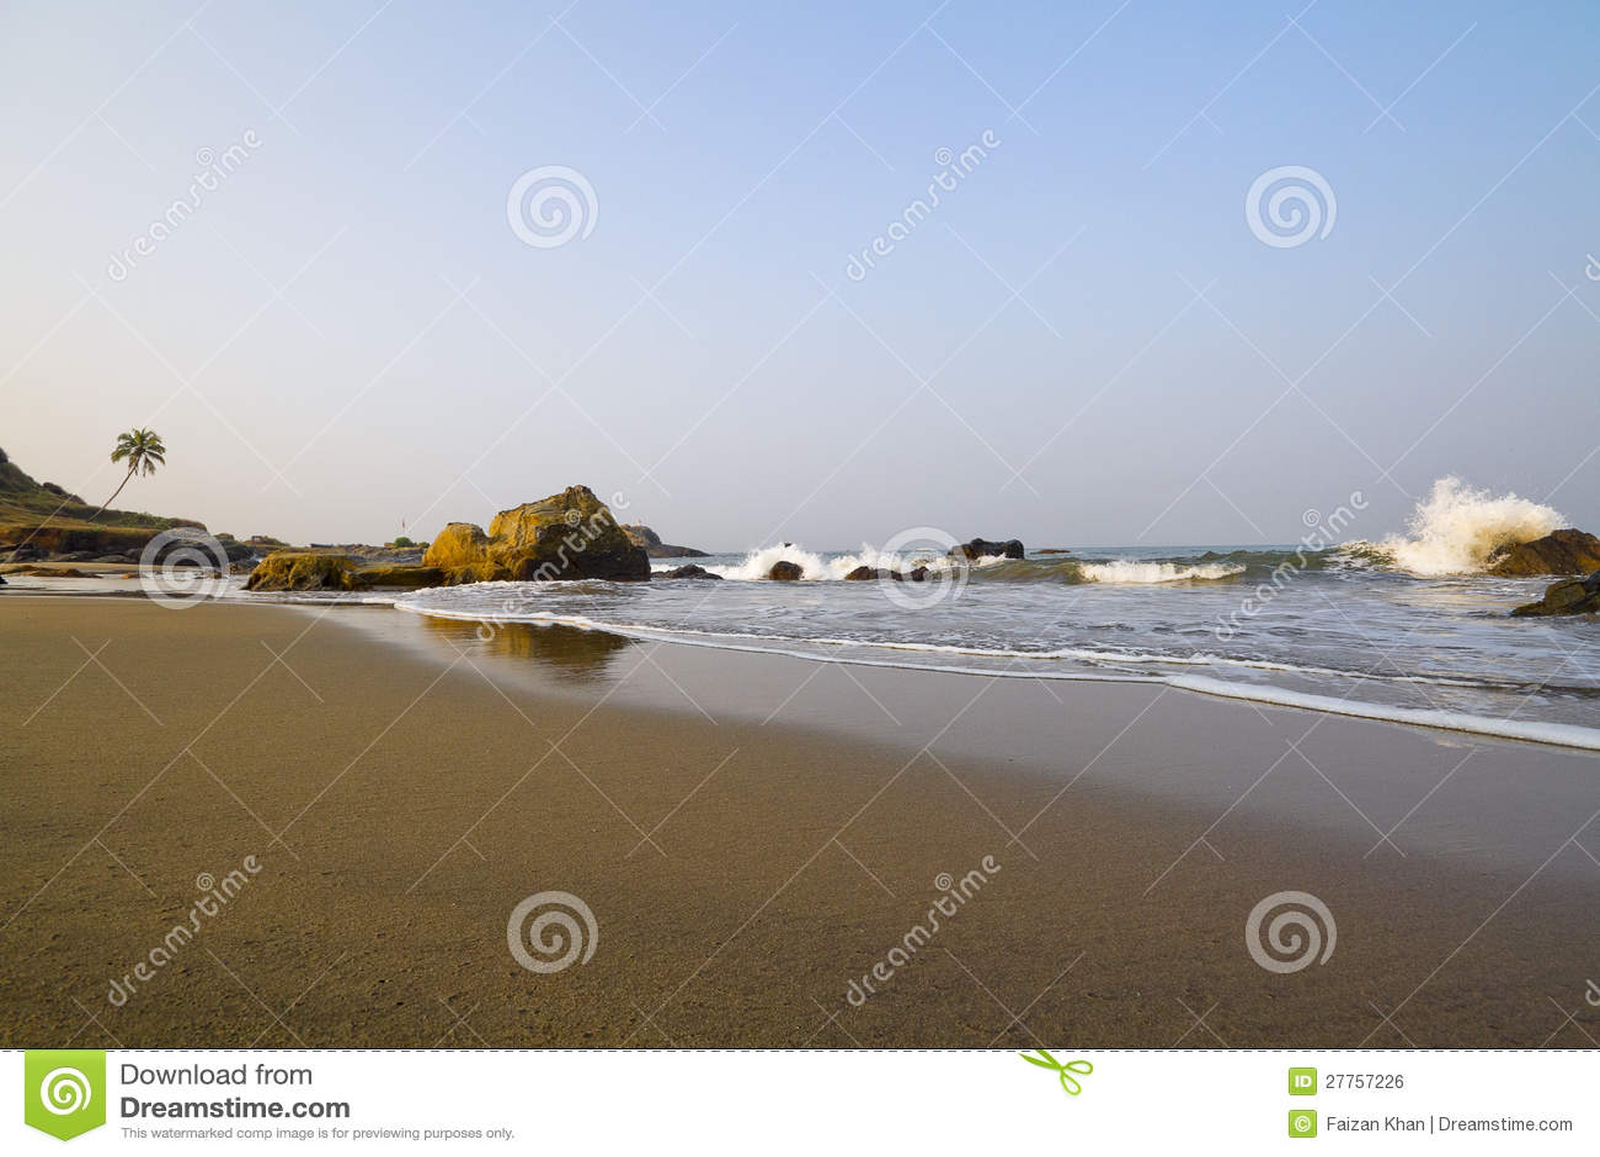 Beach and Sea Waves in Goa